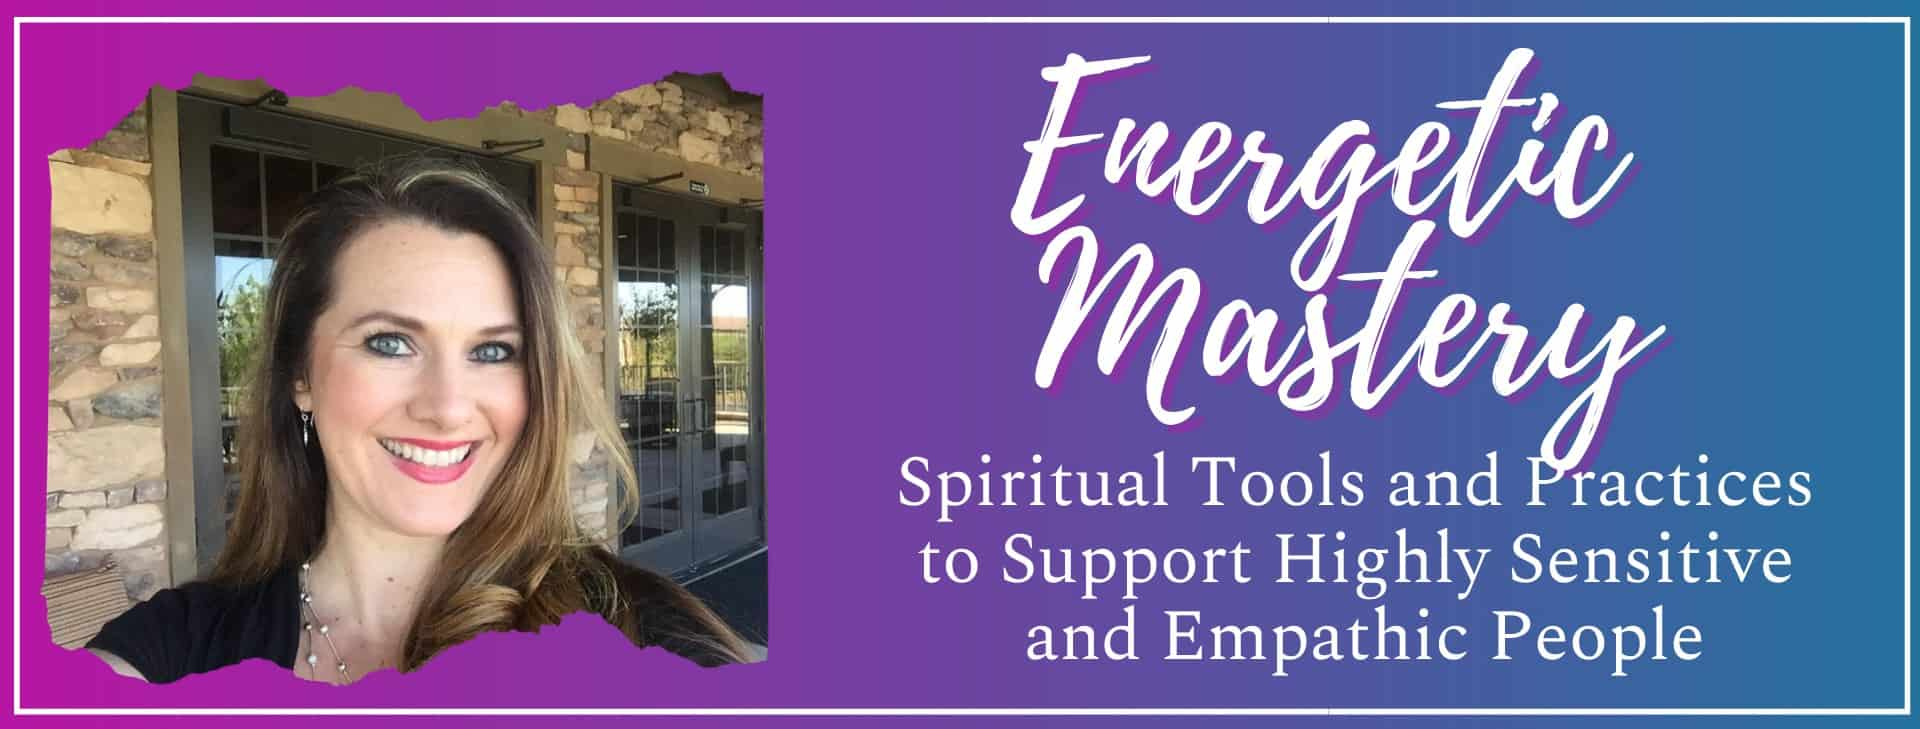 Energetic Mastery Program